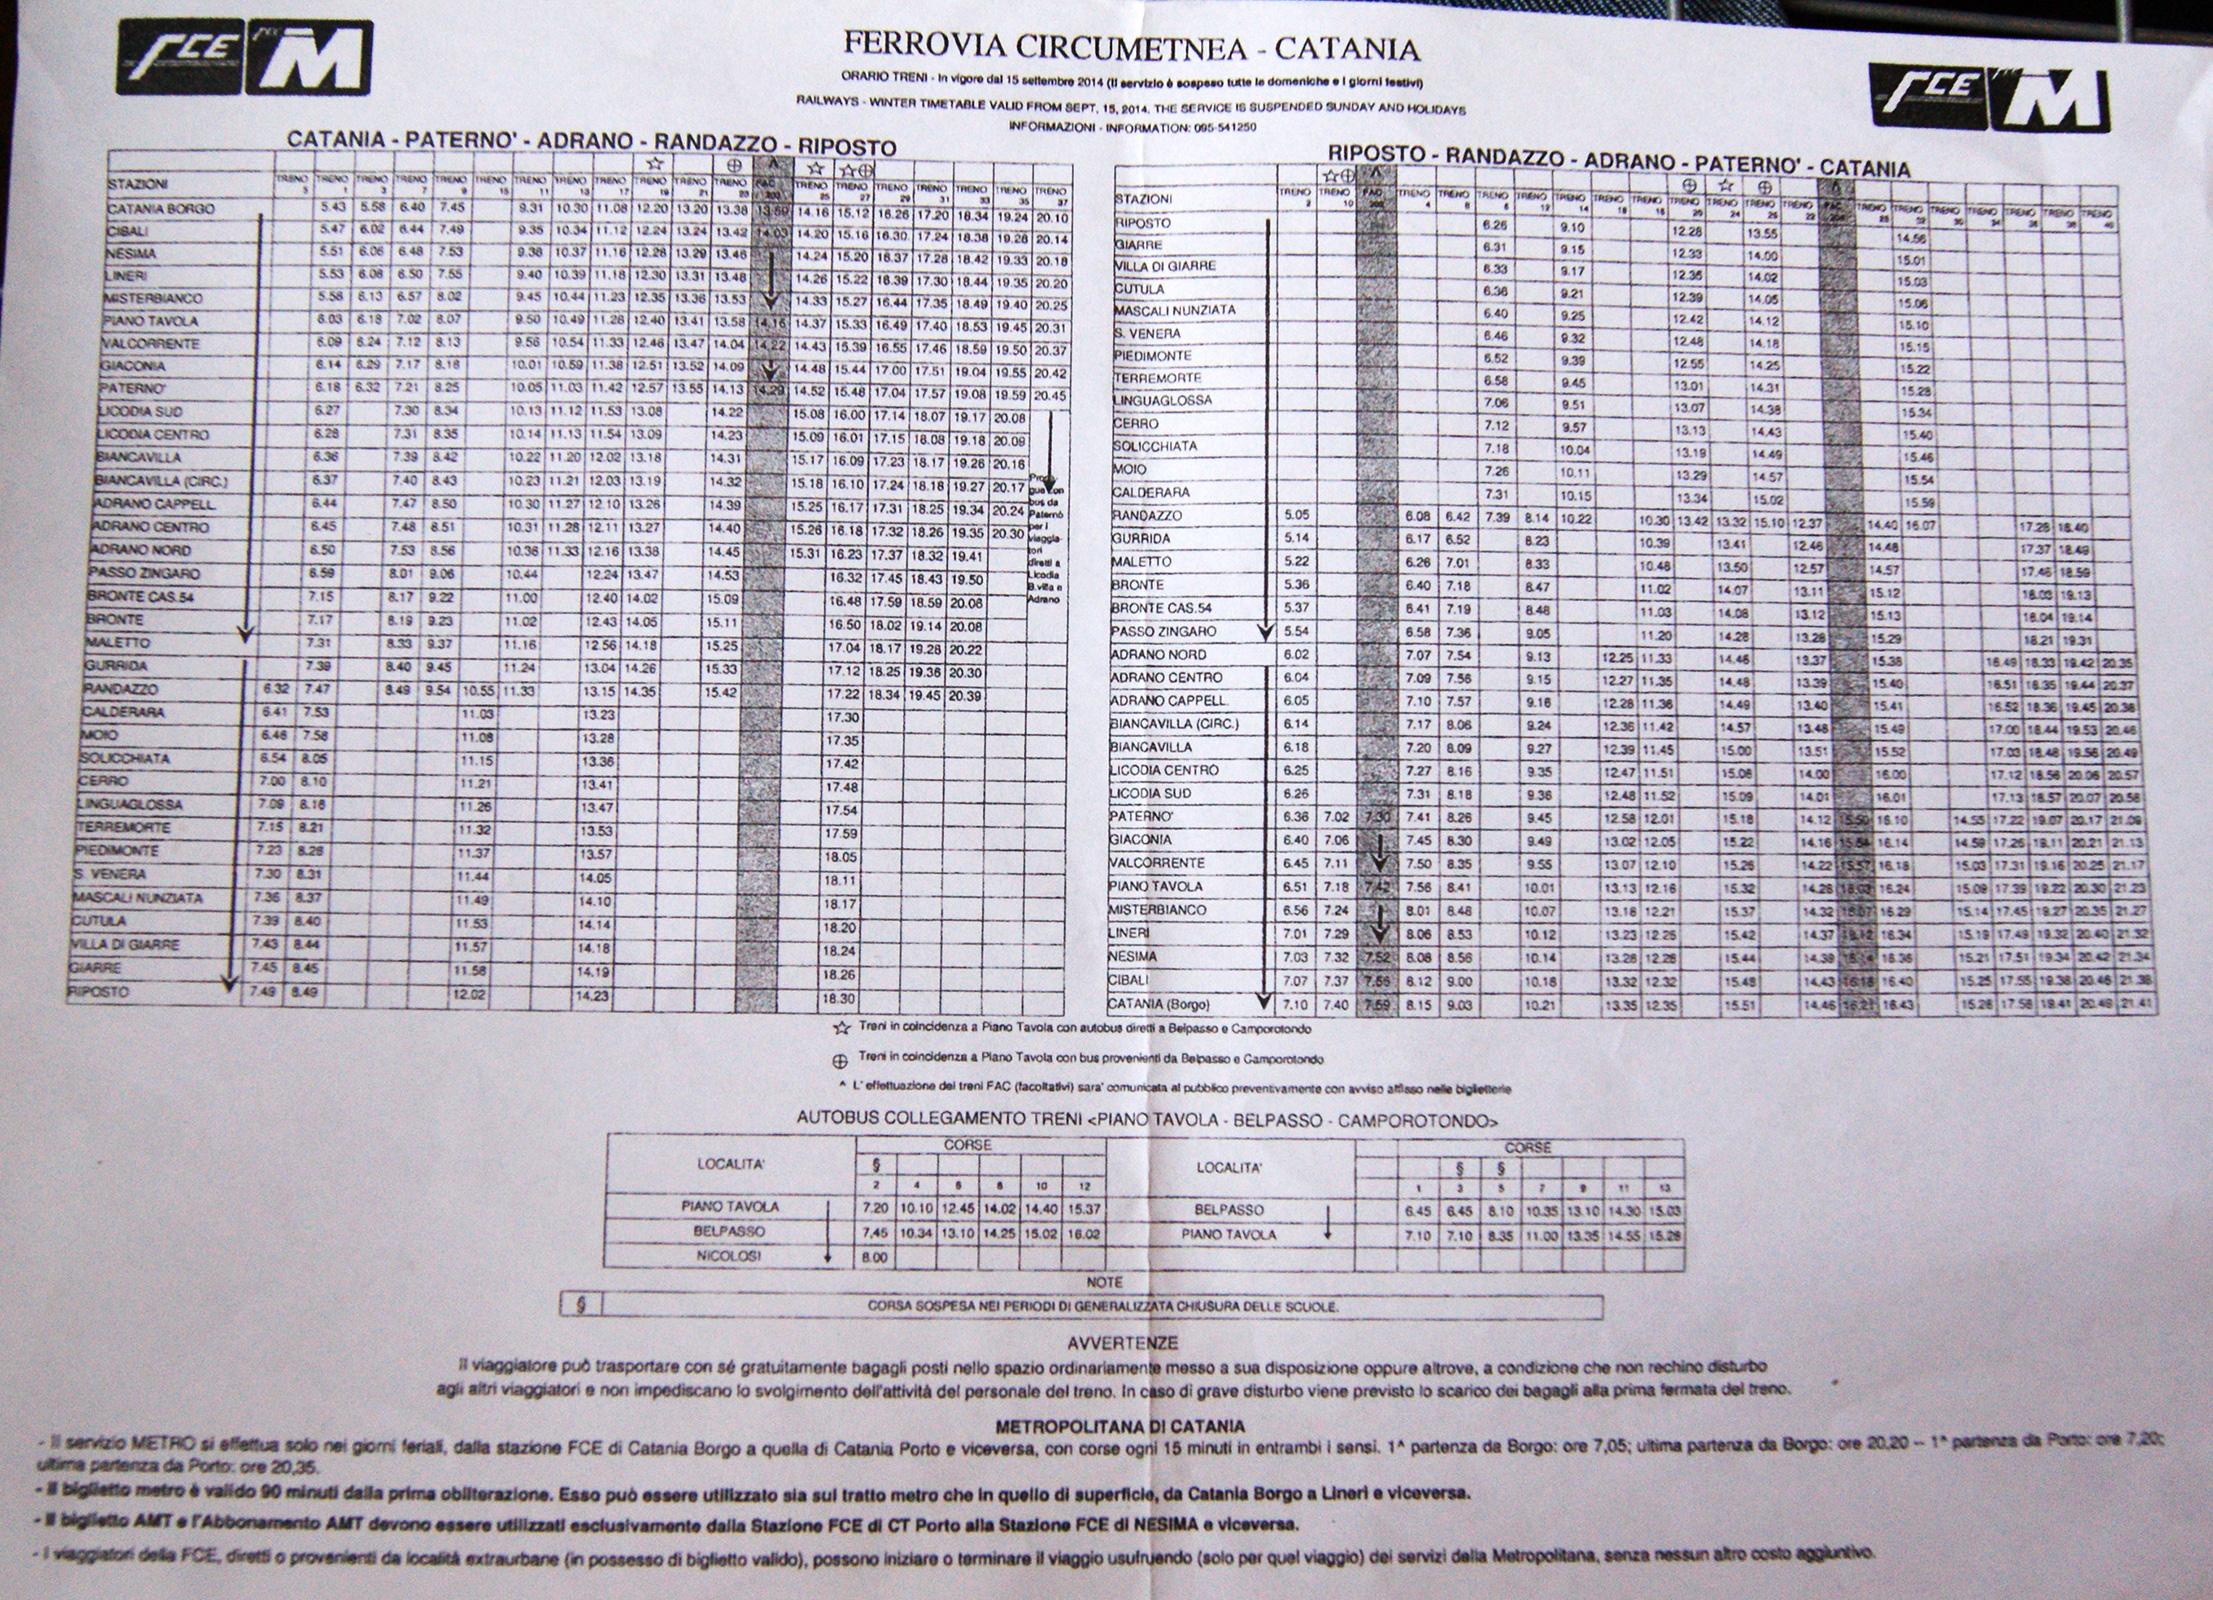 расписание-ferrovia-circumetnea